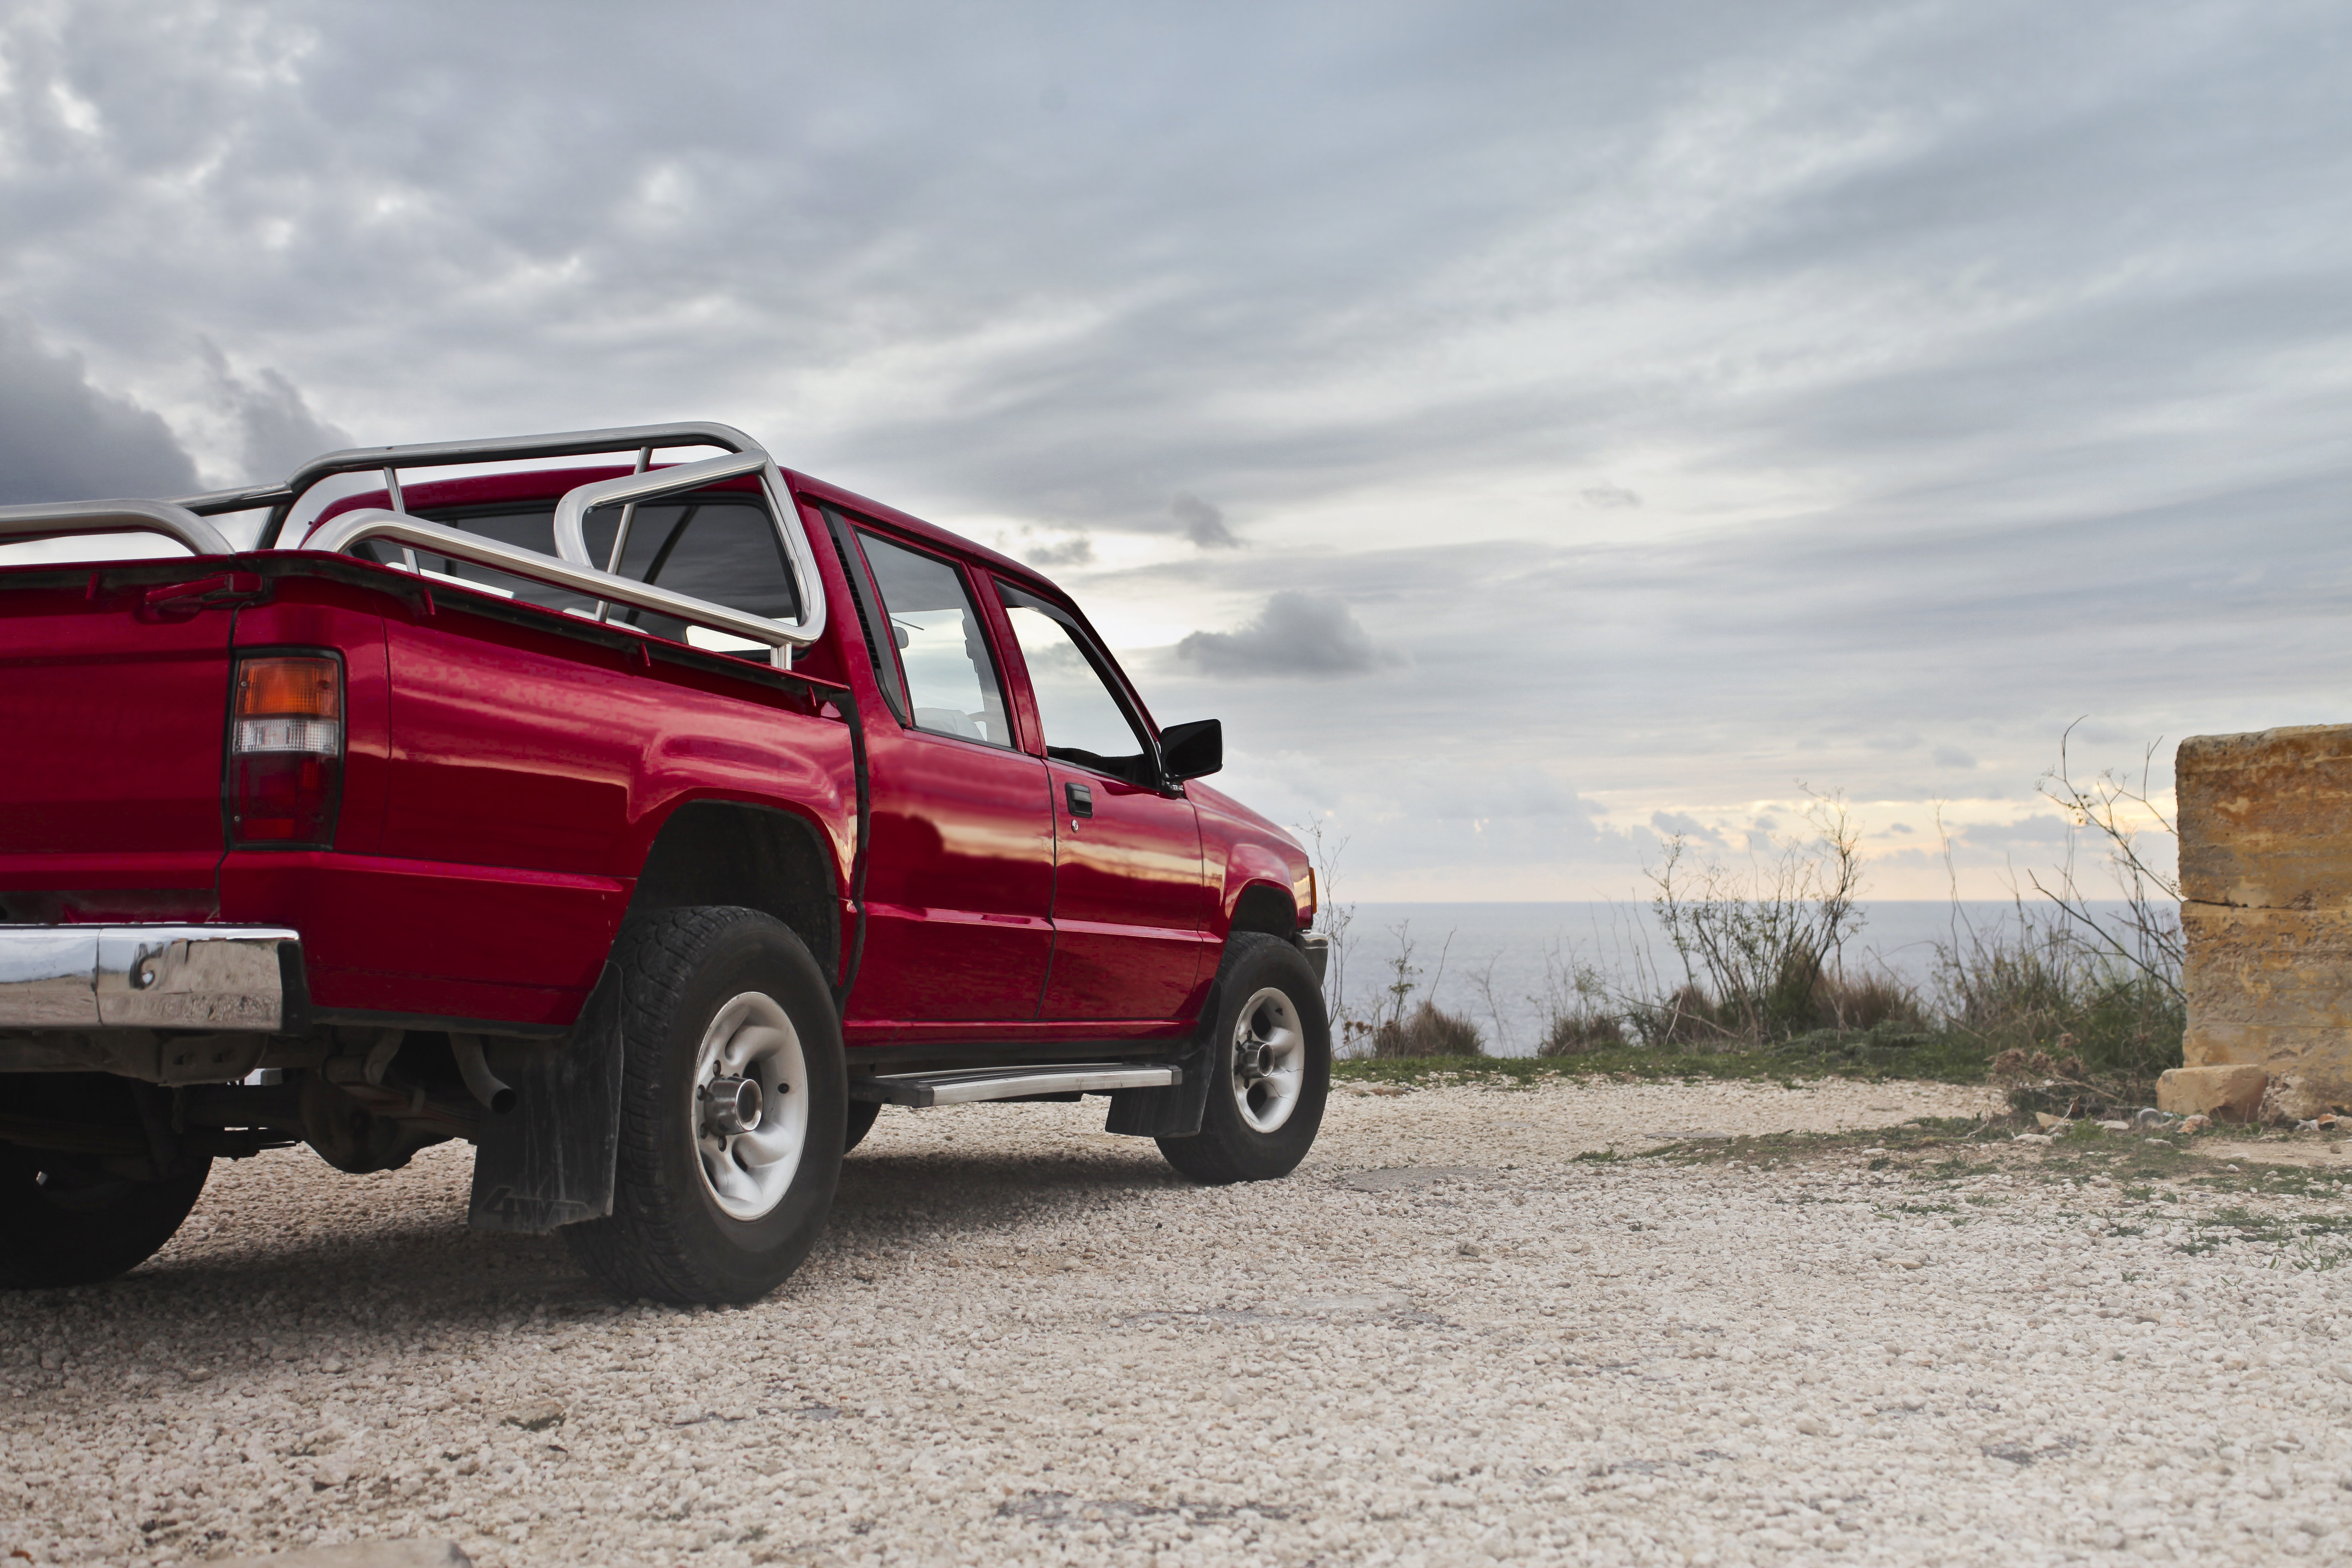 Used Truck Dealerships Near Me >> Used Truck Dealer Elizabethtown Ky Oxmoor Auto Group